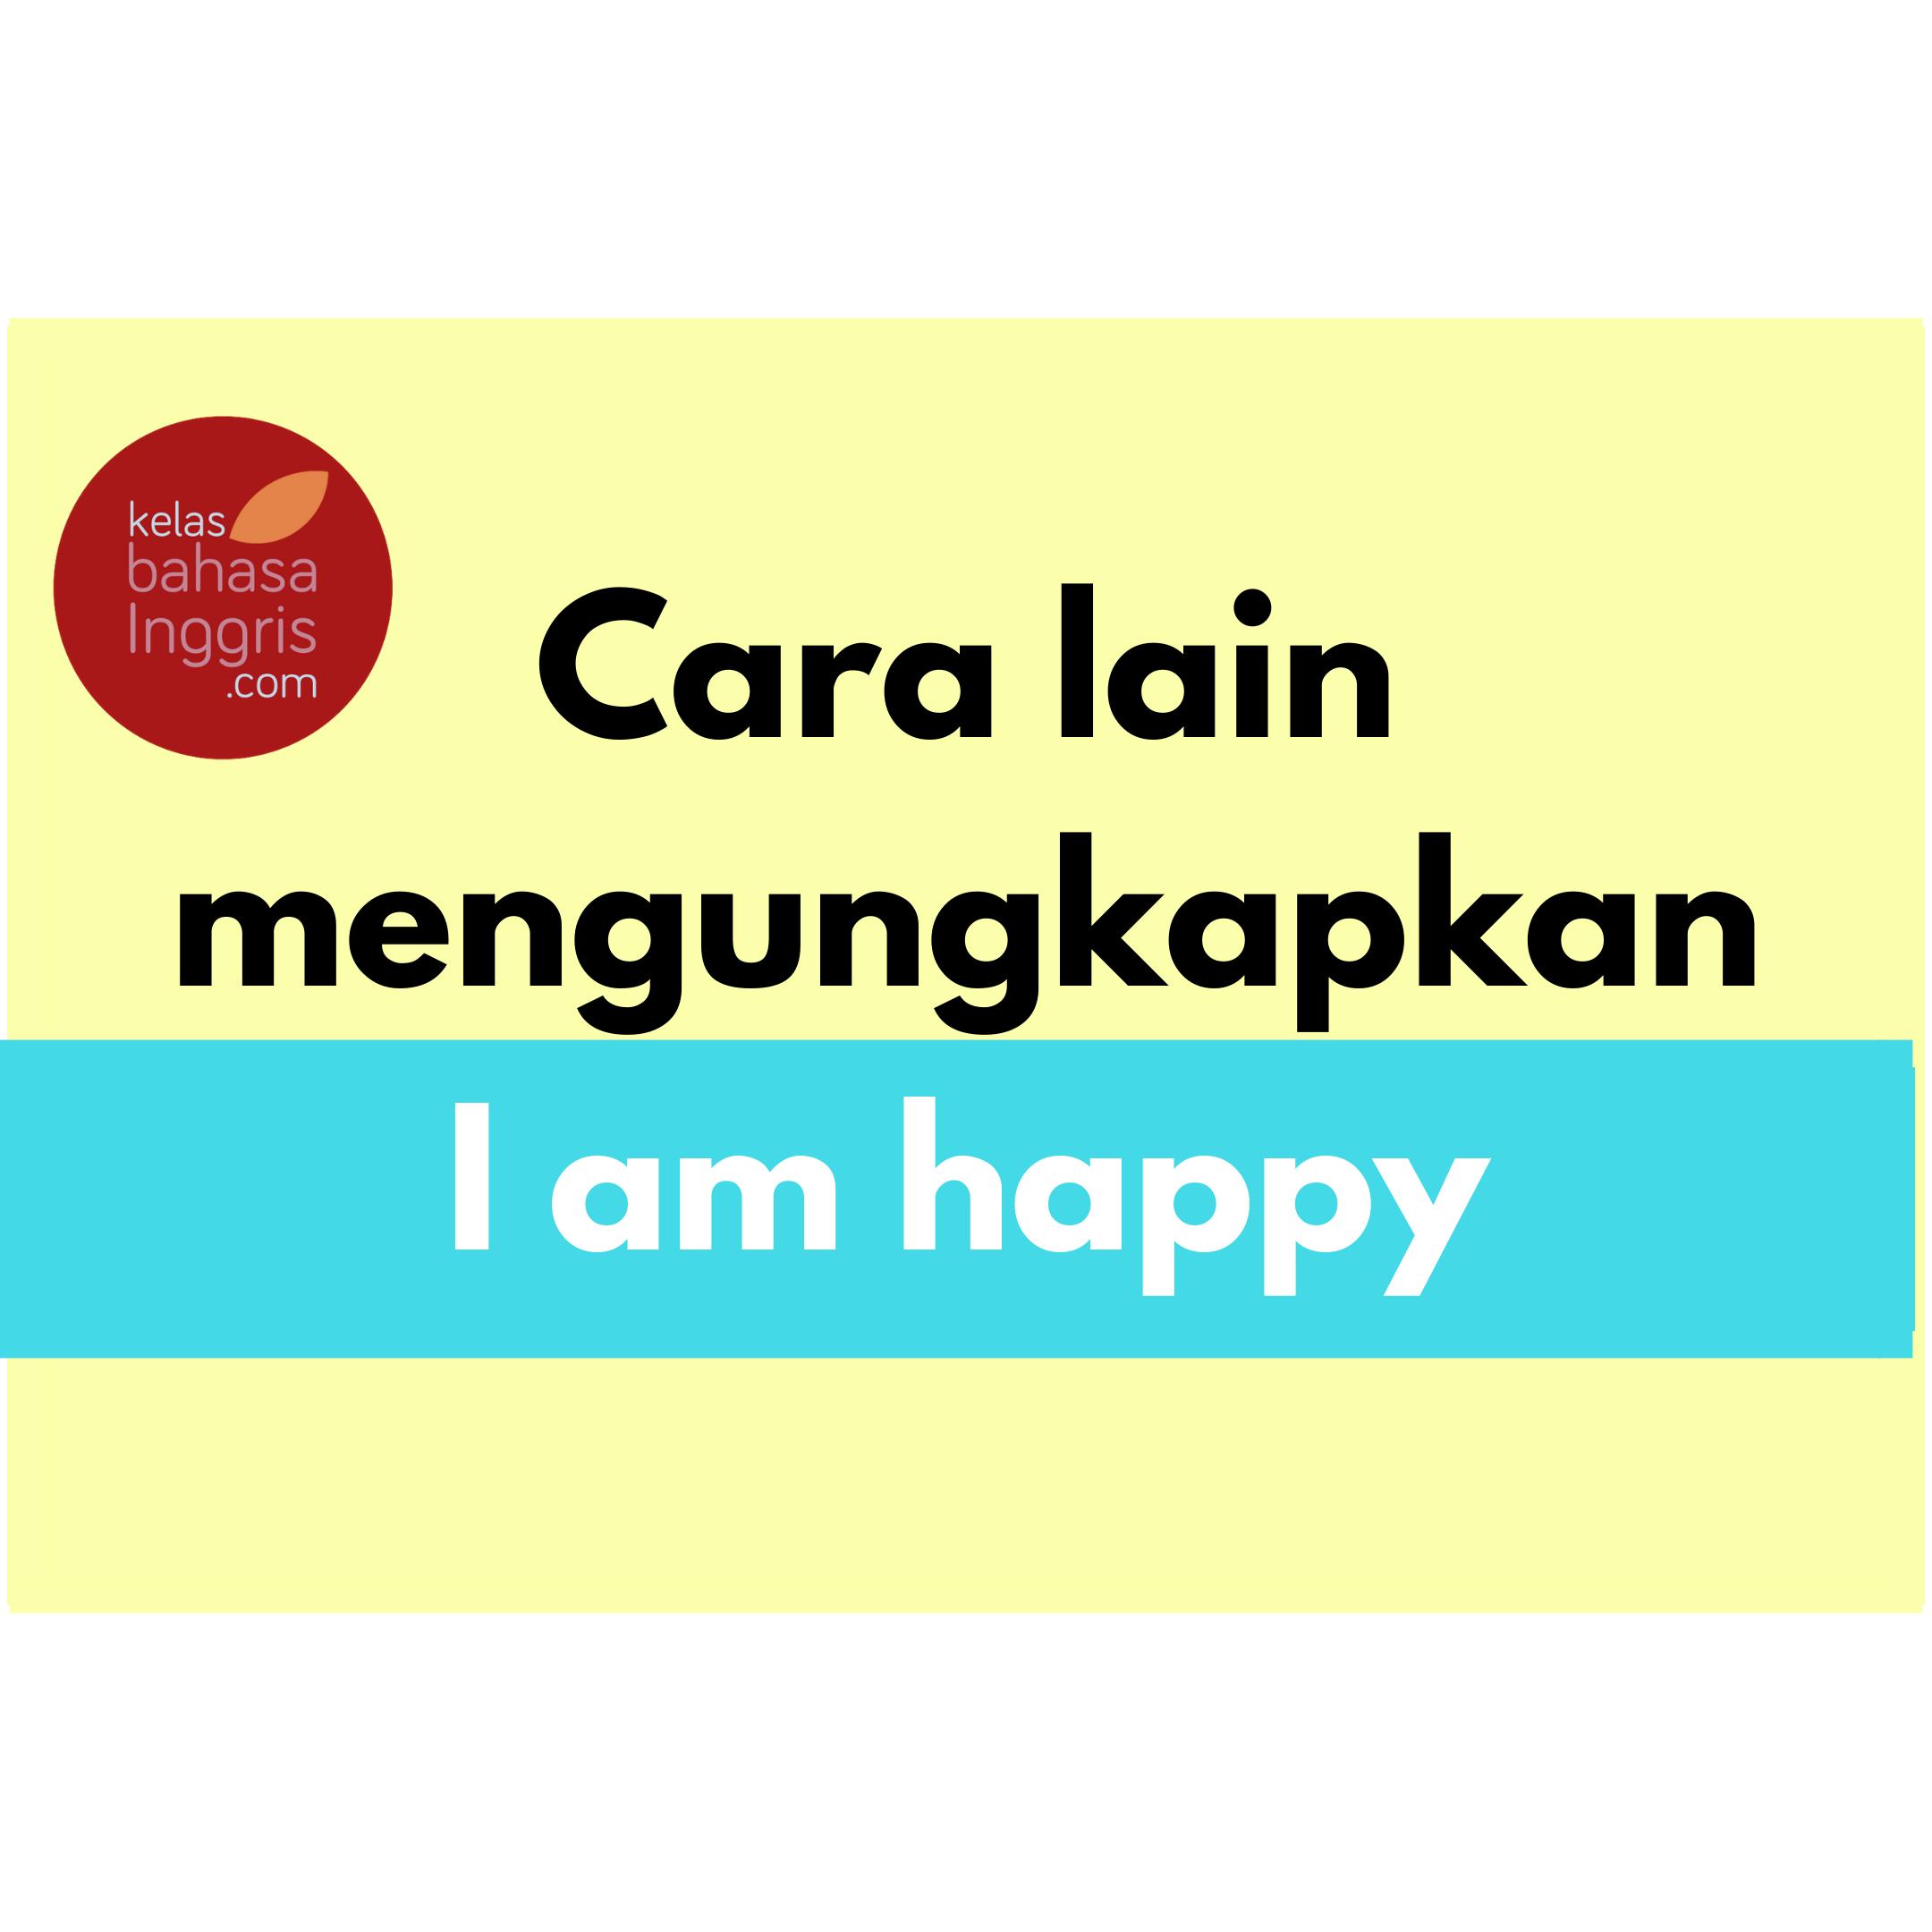 Cara lain mengungkapkan I am happy